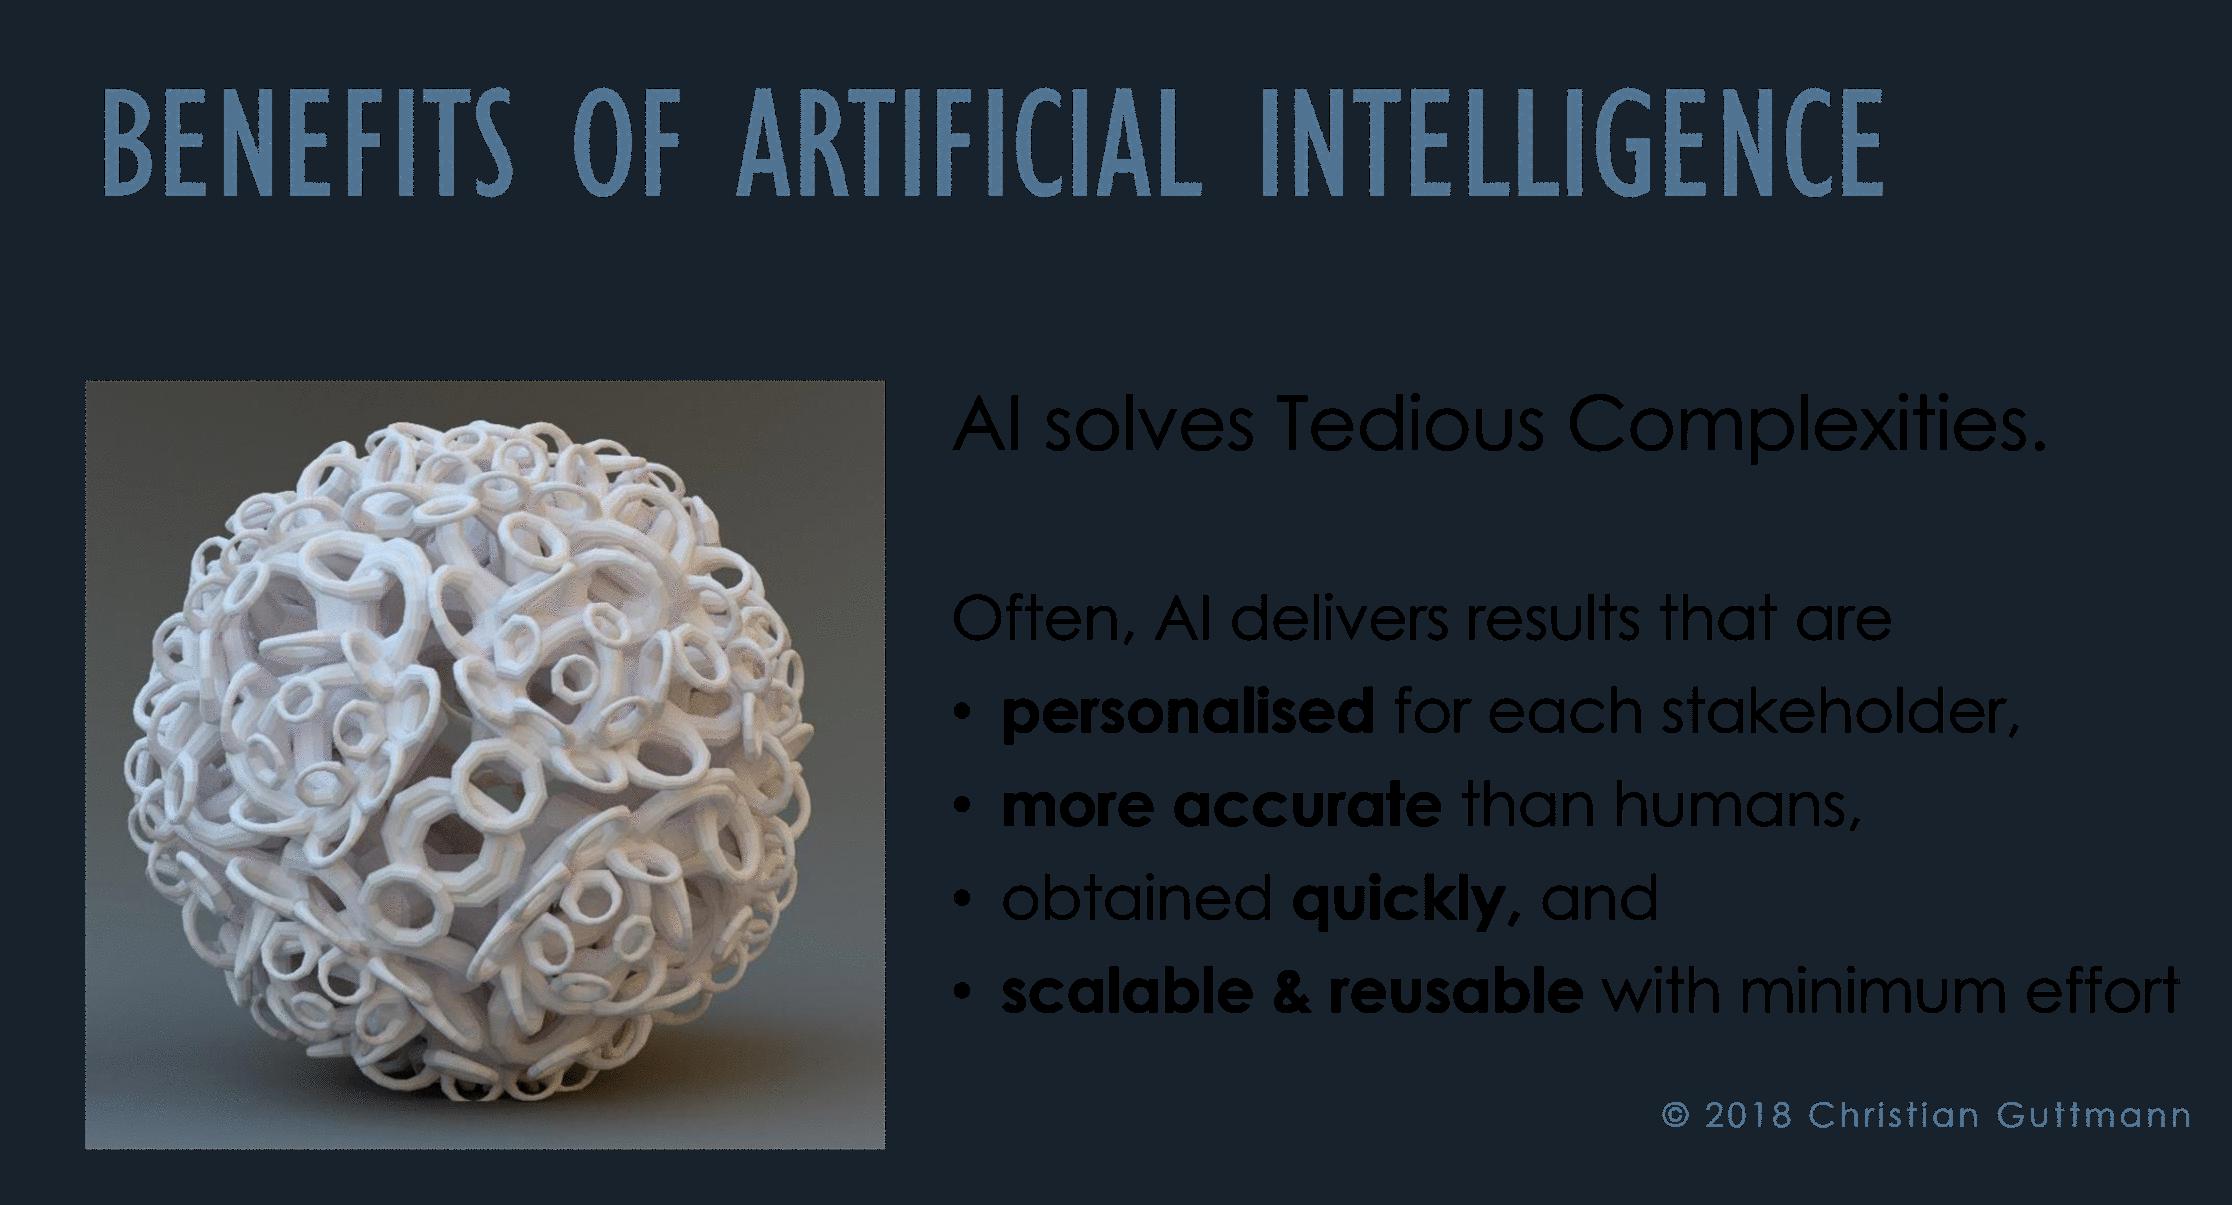 benefits.of.artificial.intelligence.jpg